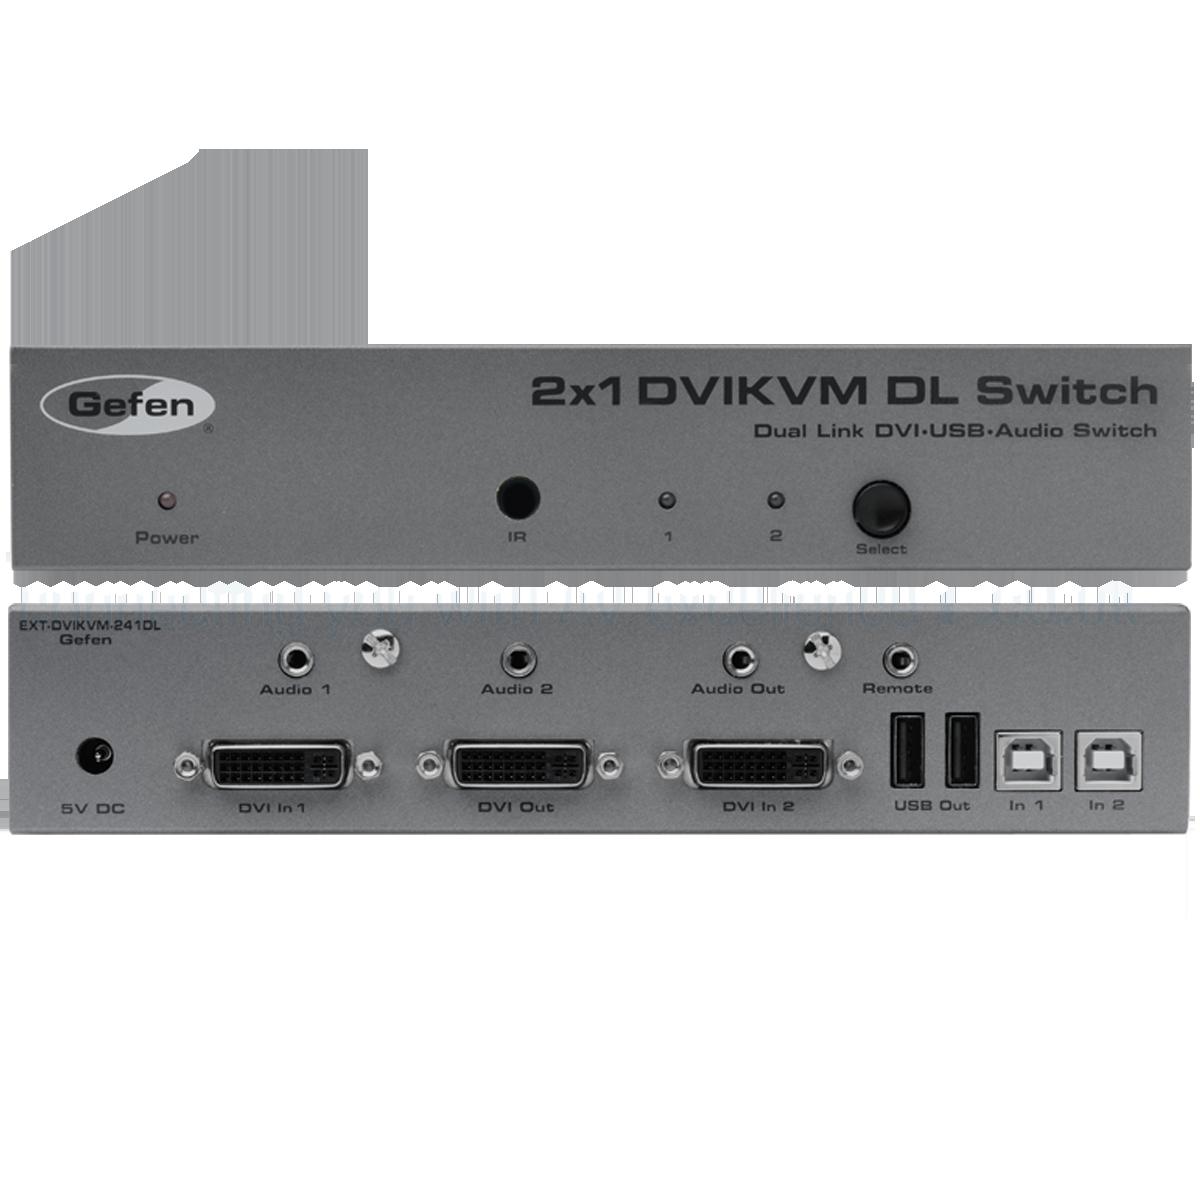 DVI KVM Switchers